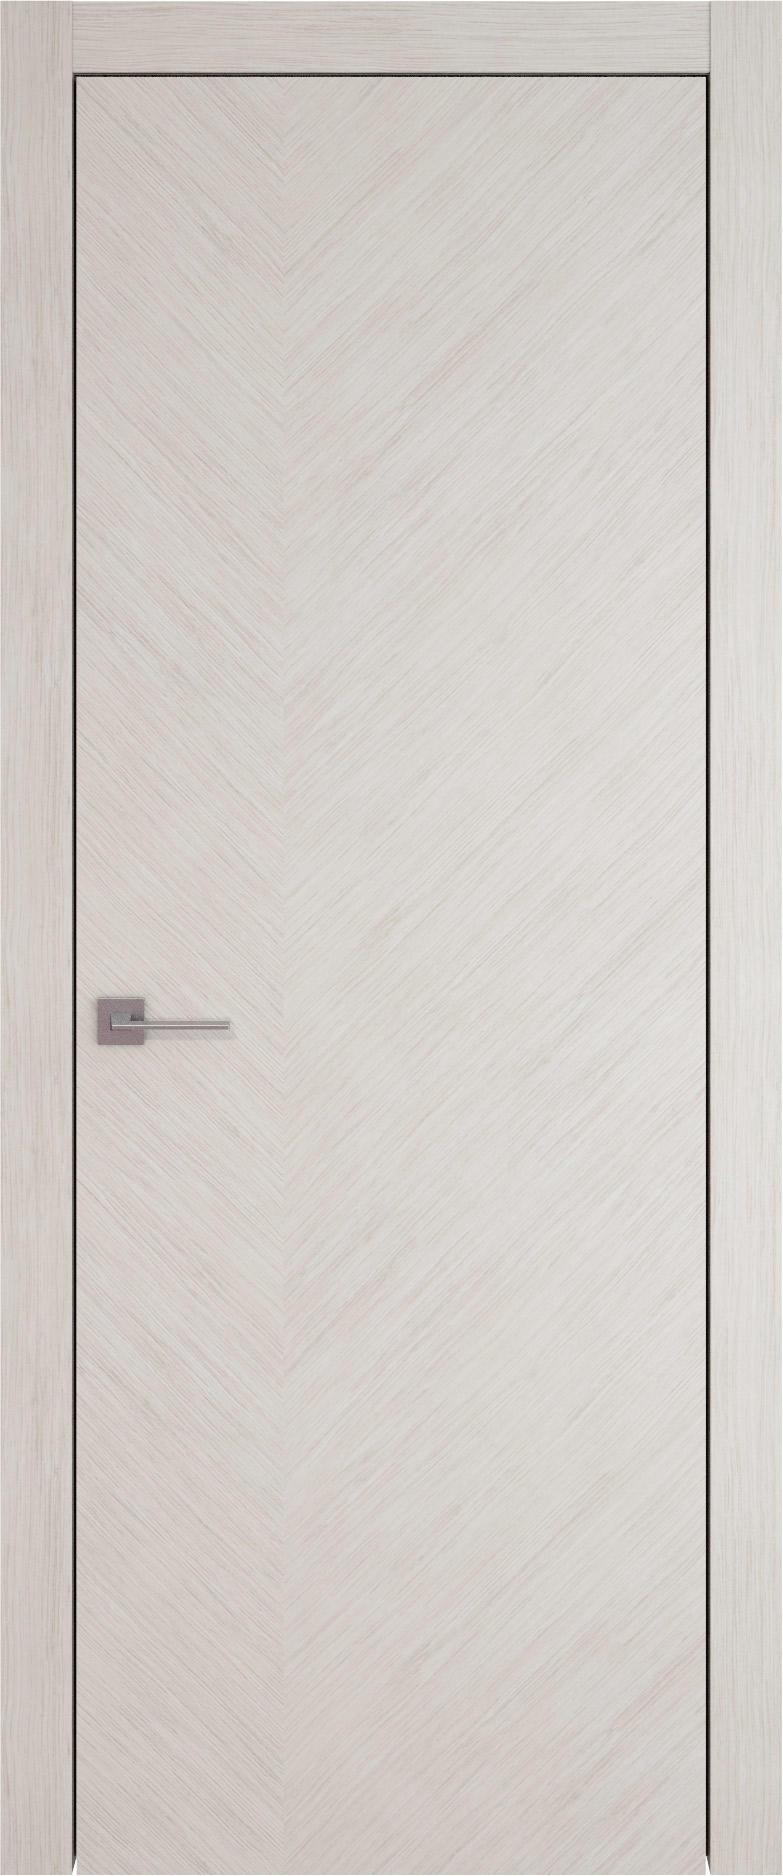 Tivoli Л-1 цвет - Дымчатый дуб Без стекла (ДГ)